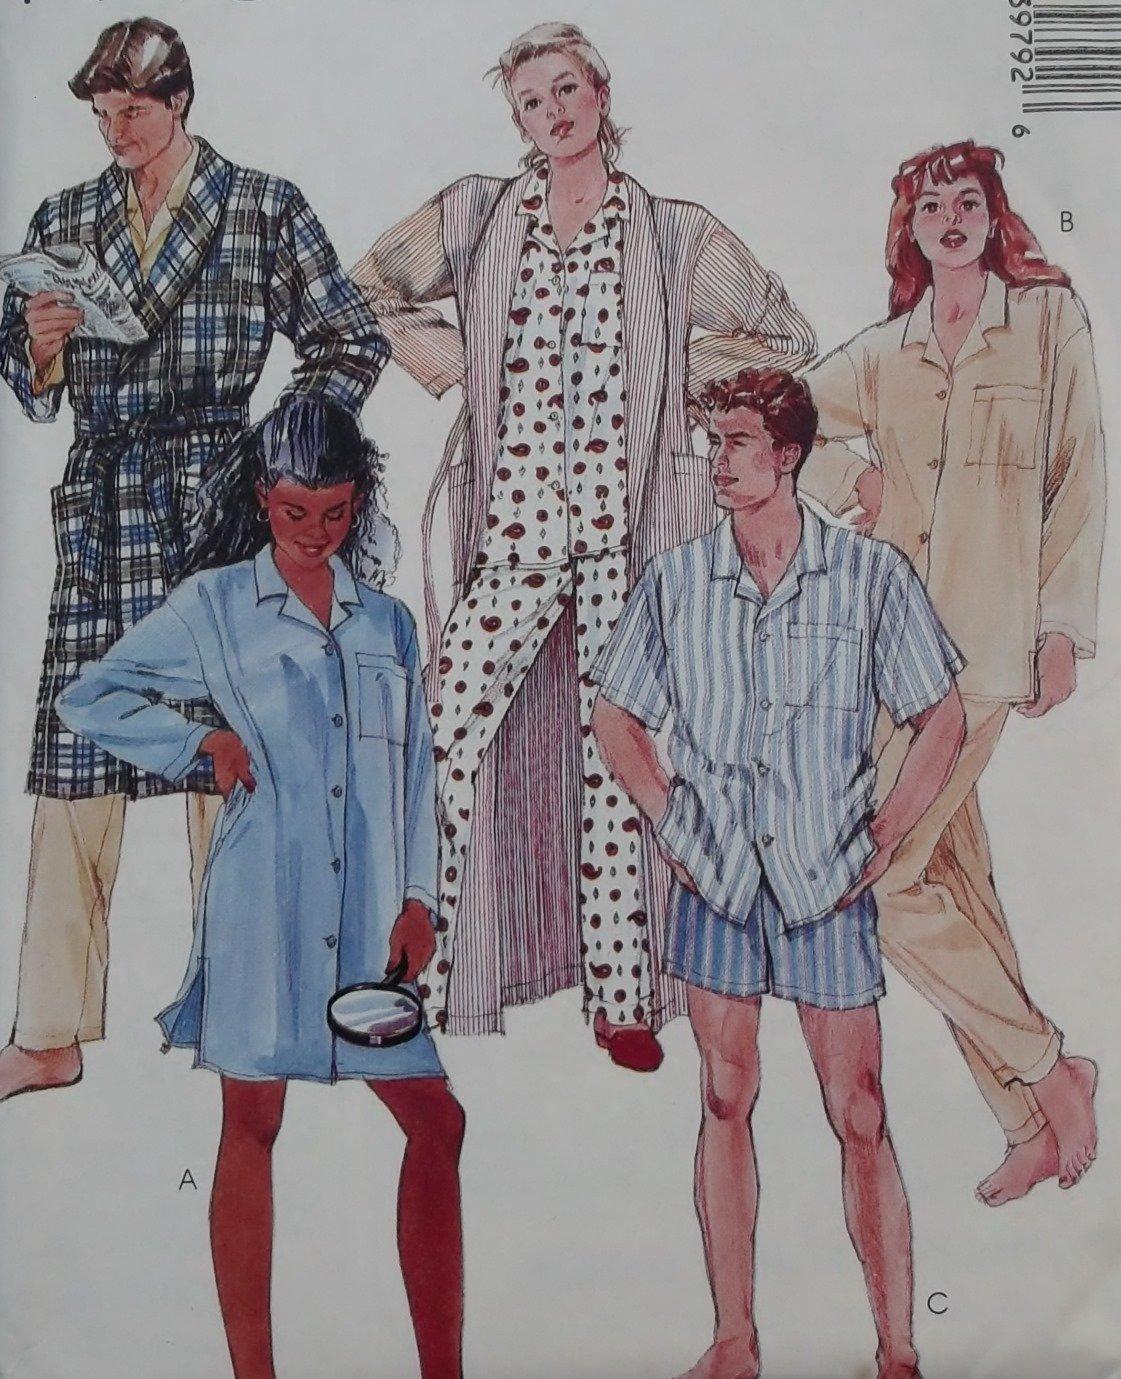 Mccalls 3979 Misses, Men, Teen Robe Nightshirt Pajamas Pattern, Size Med, UNCUT